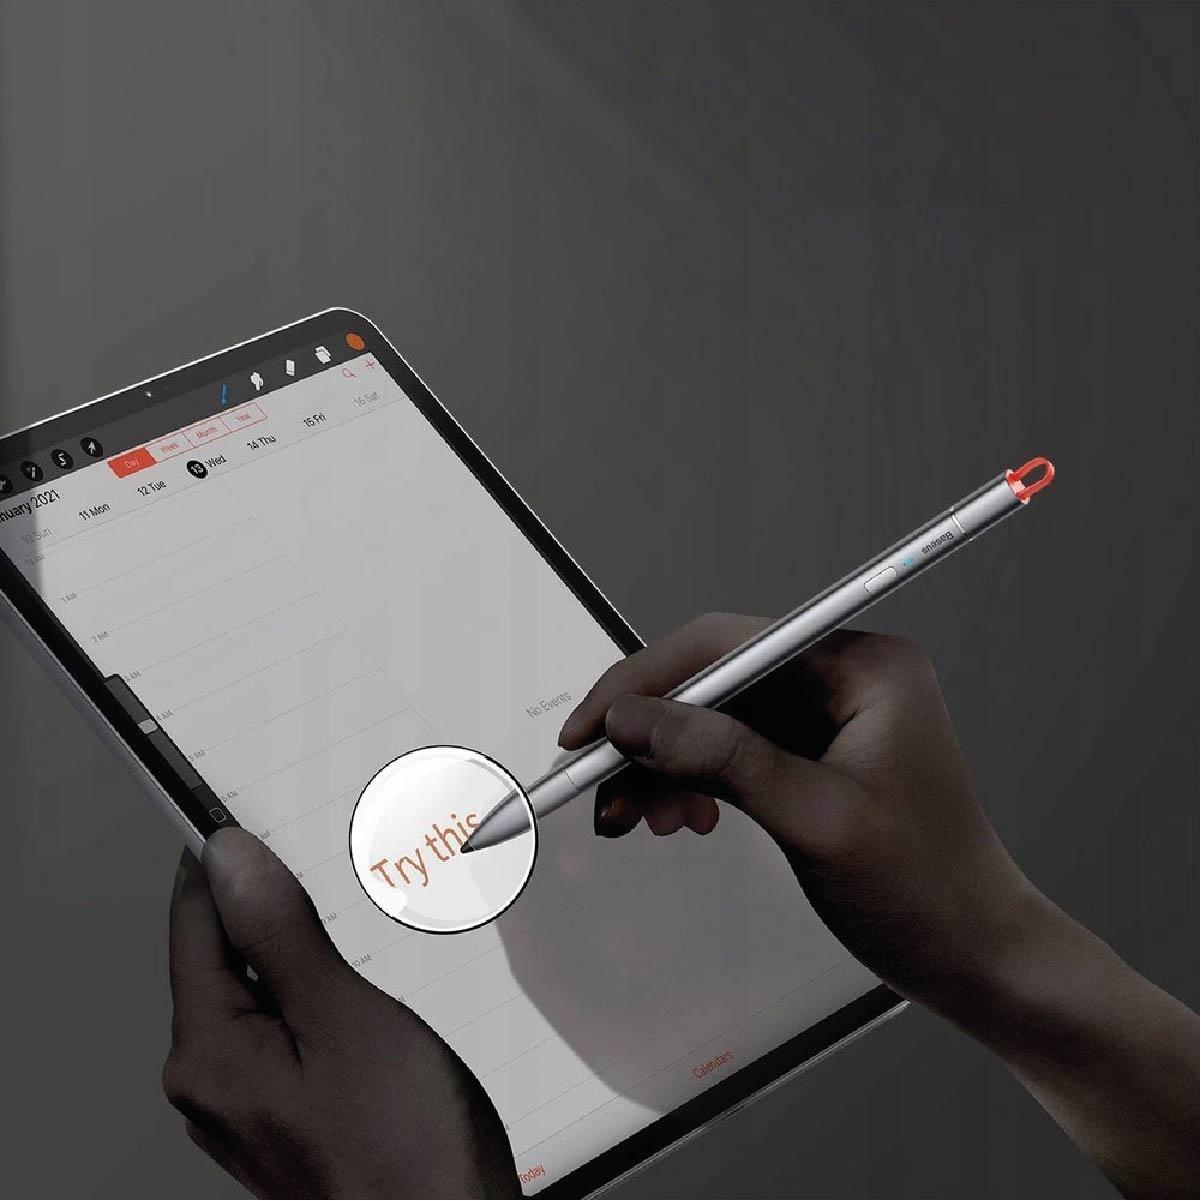 Caneta Ativa Capacitiva Stylus Touch Pen Baseus